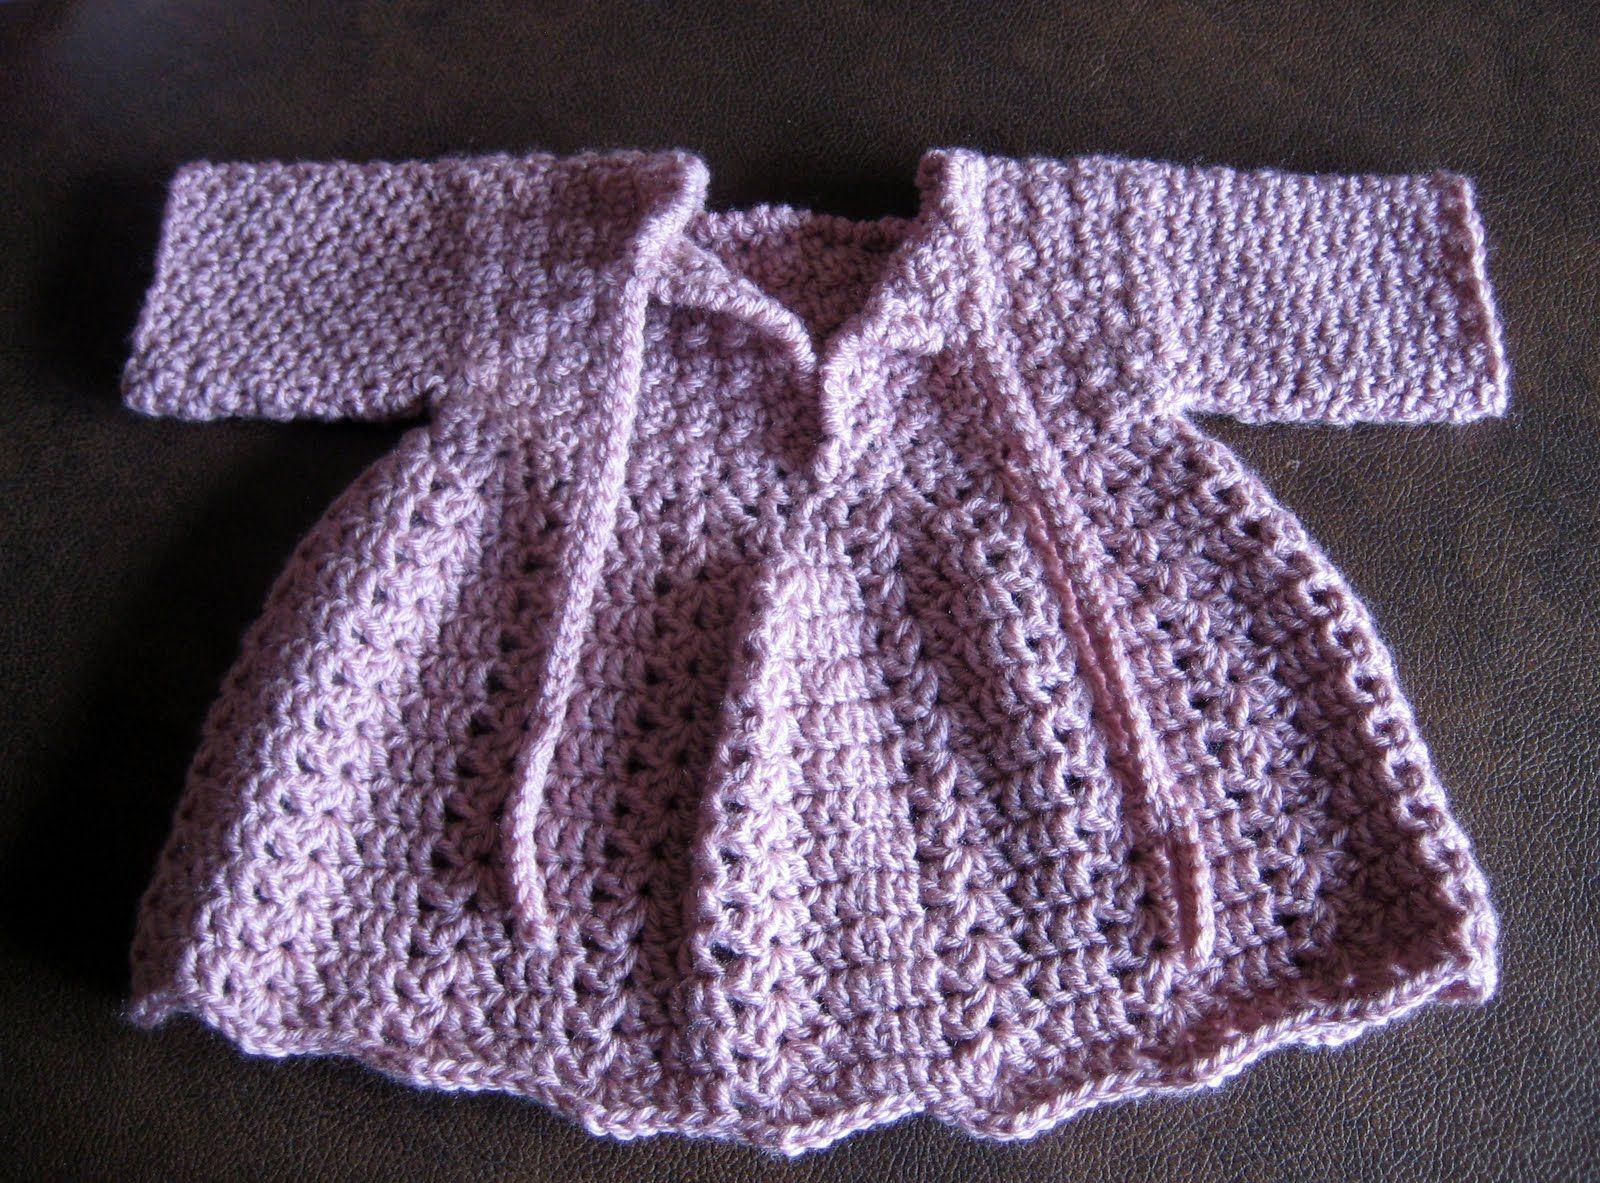 Free Crochet Baby Shoes Patterns | ... dresses crochet dress baby ...